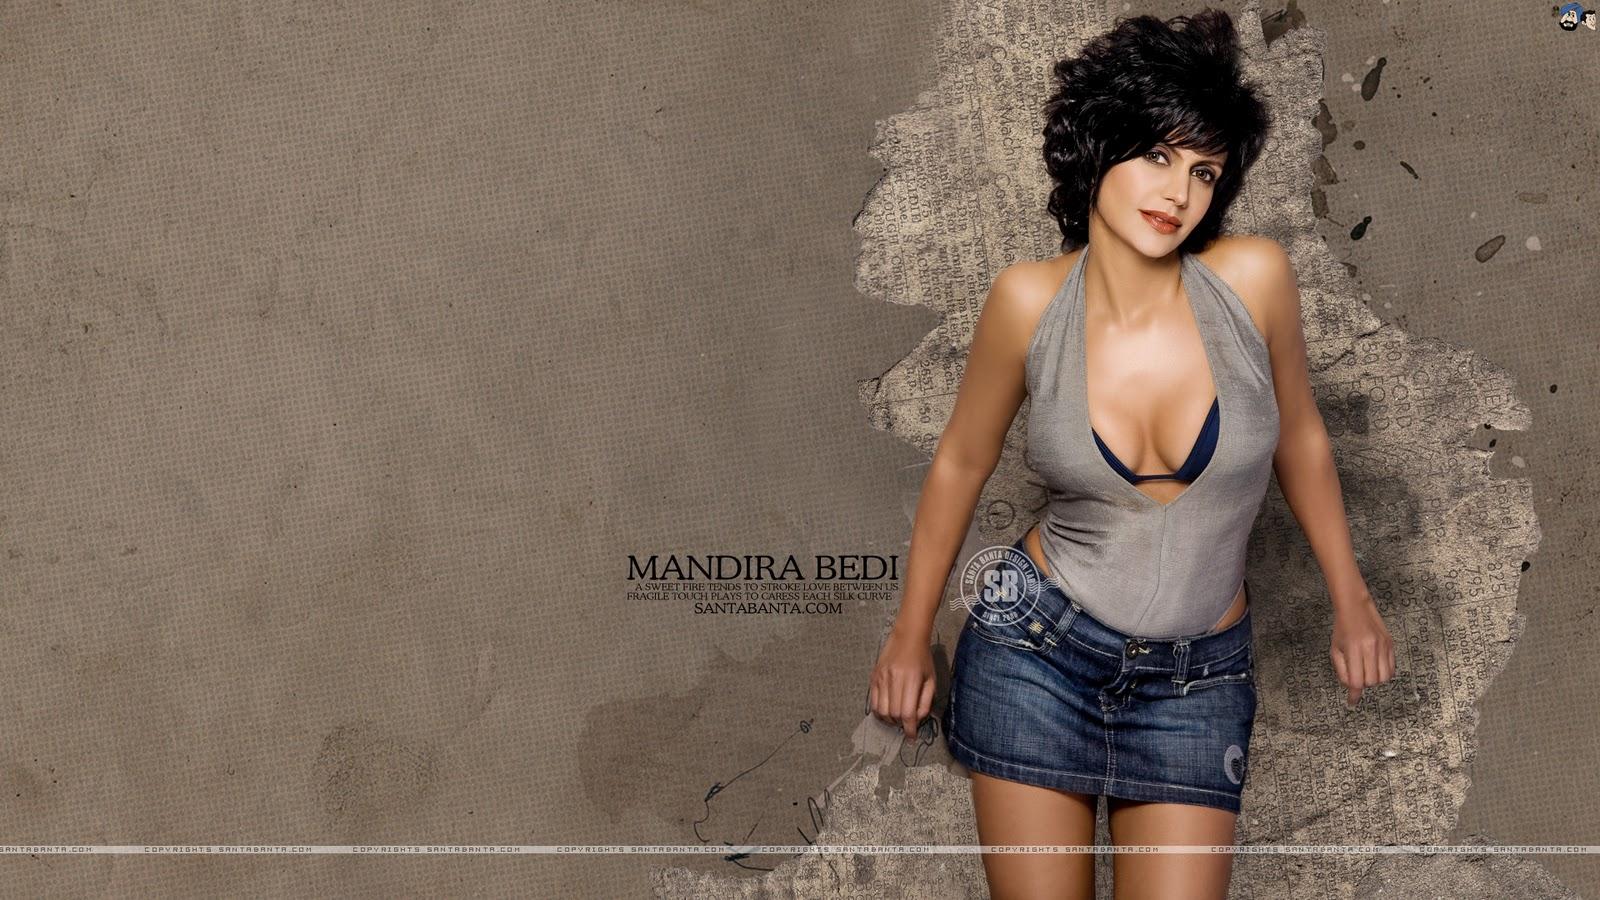 Sexy Pics Of Mandira Bedi